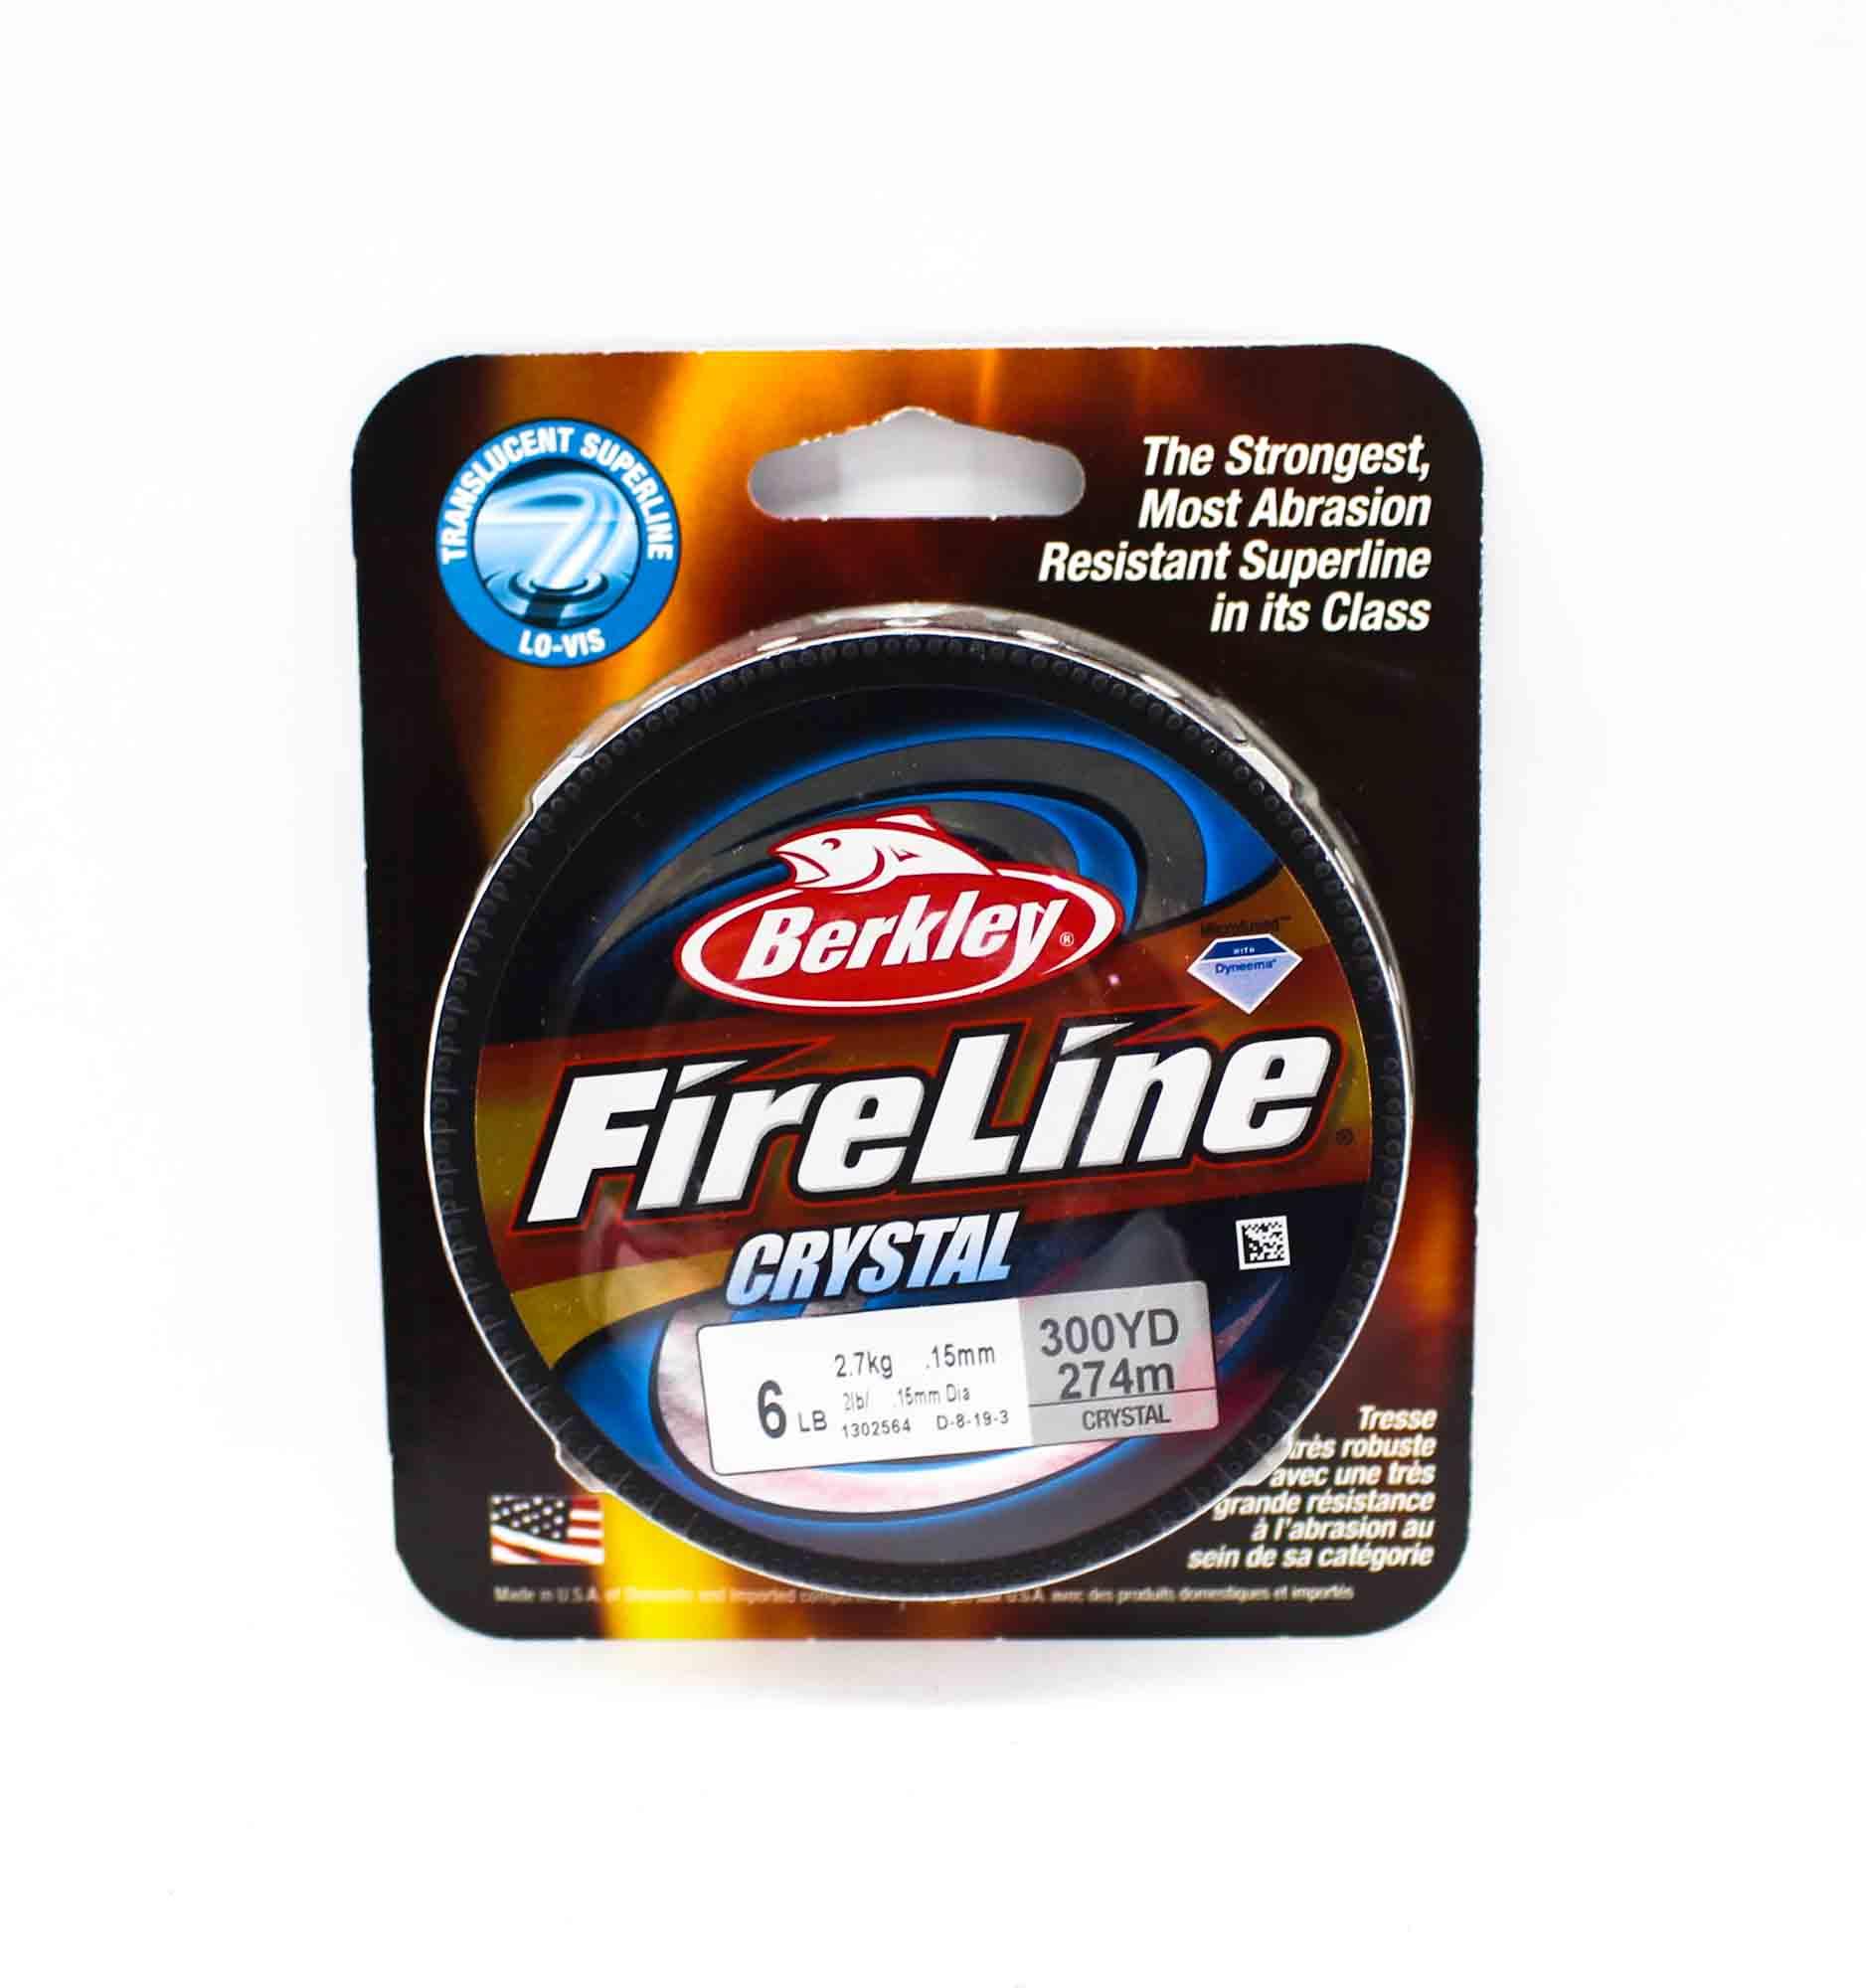 Berkley Fused Fireline Crystal 300yds 6lb White (4898)